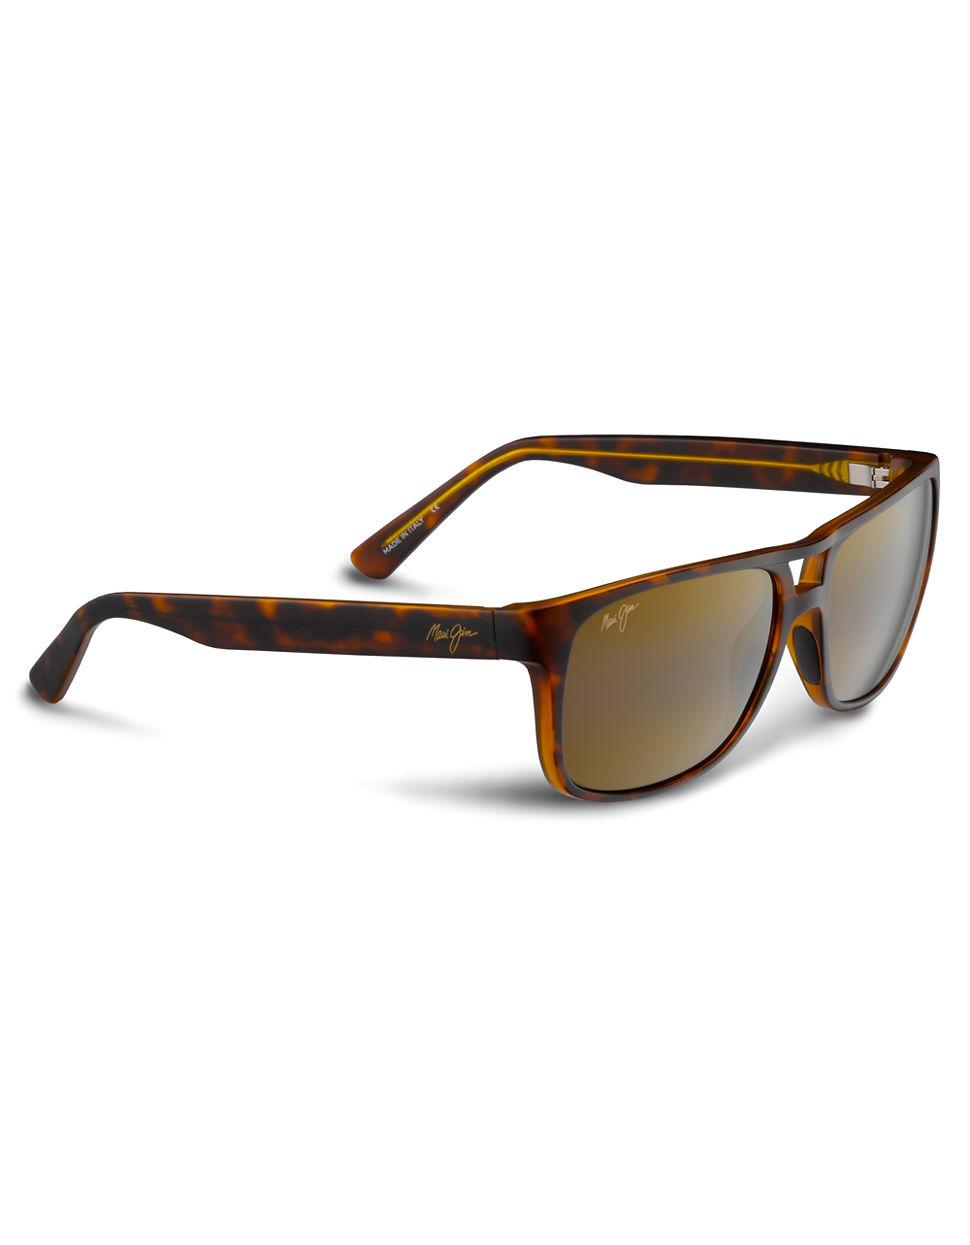 Maui Jim Waterways Polarized Wayfarer Sunglasses In Brown